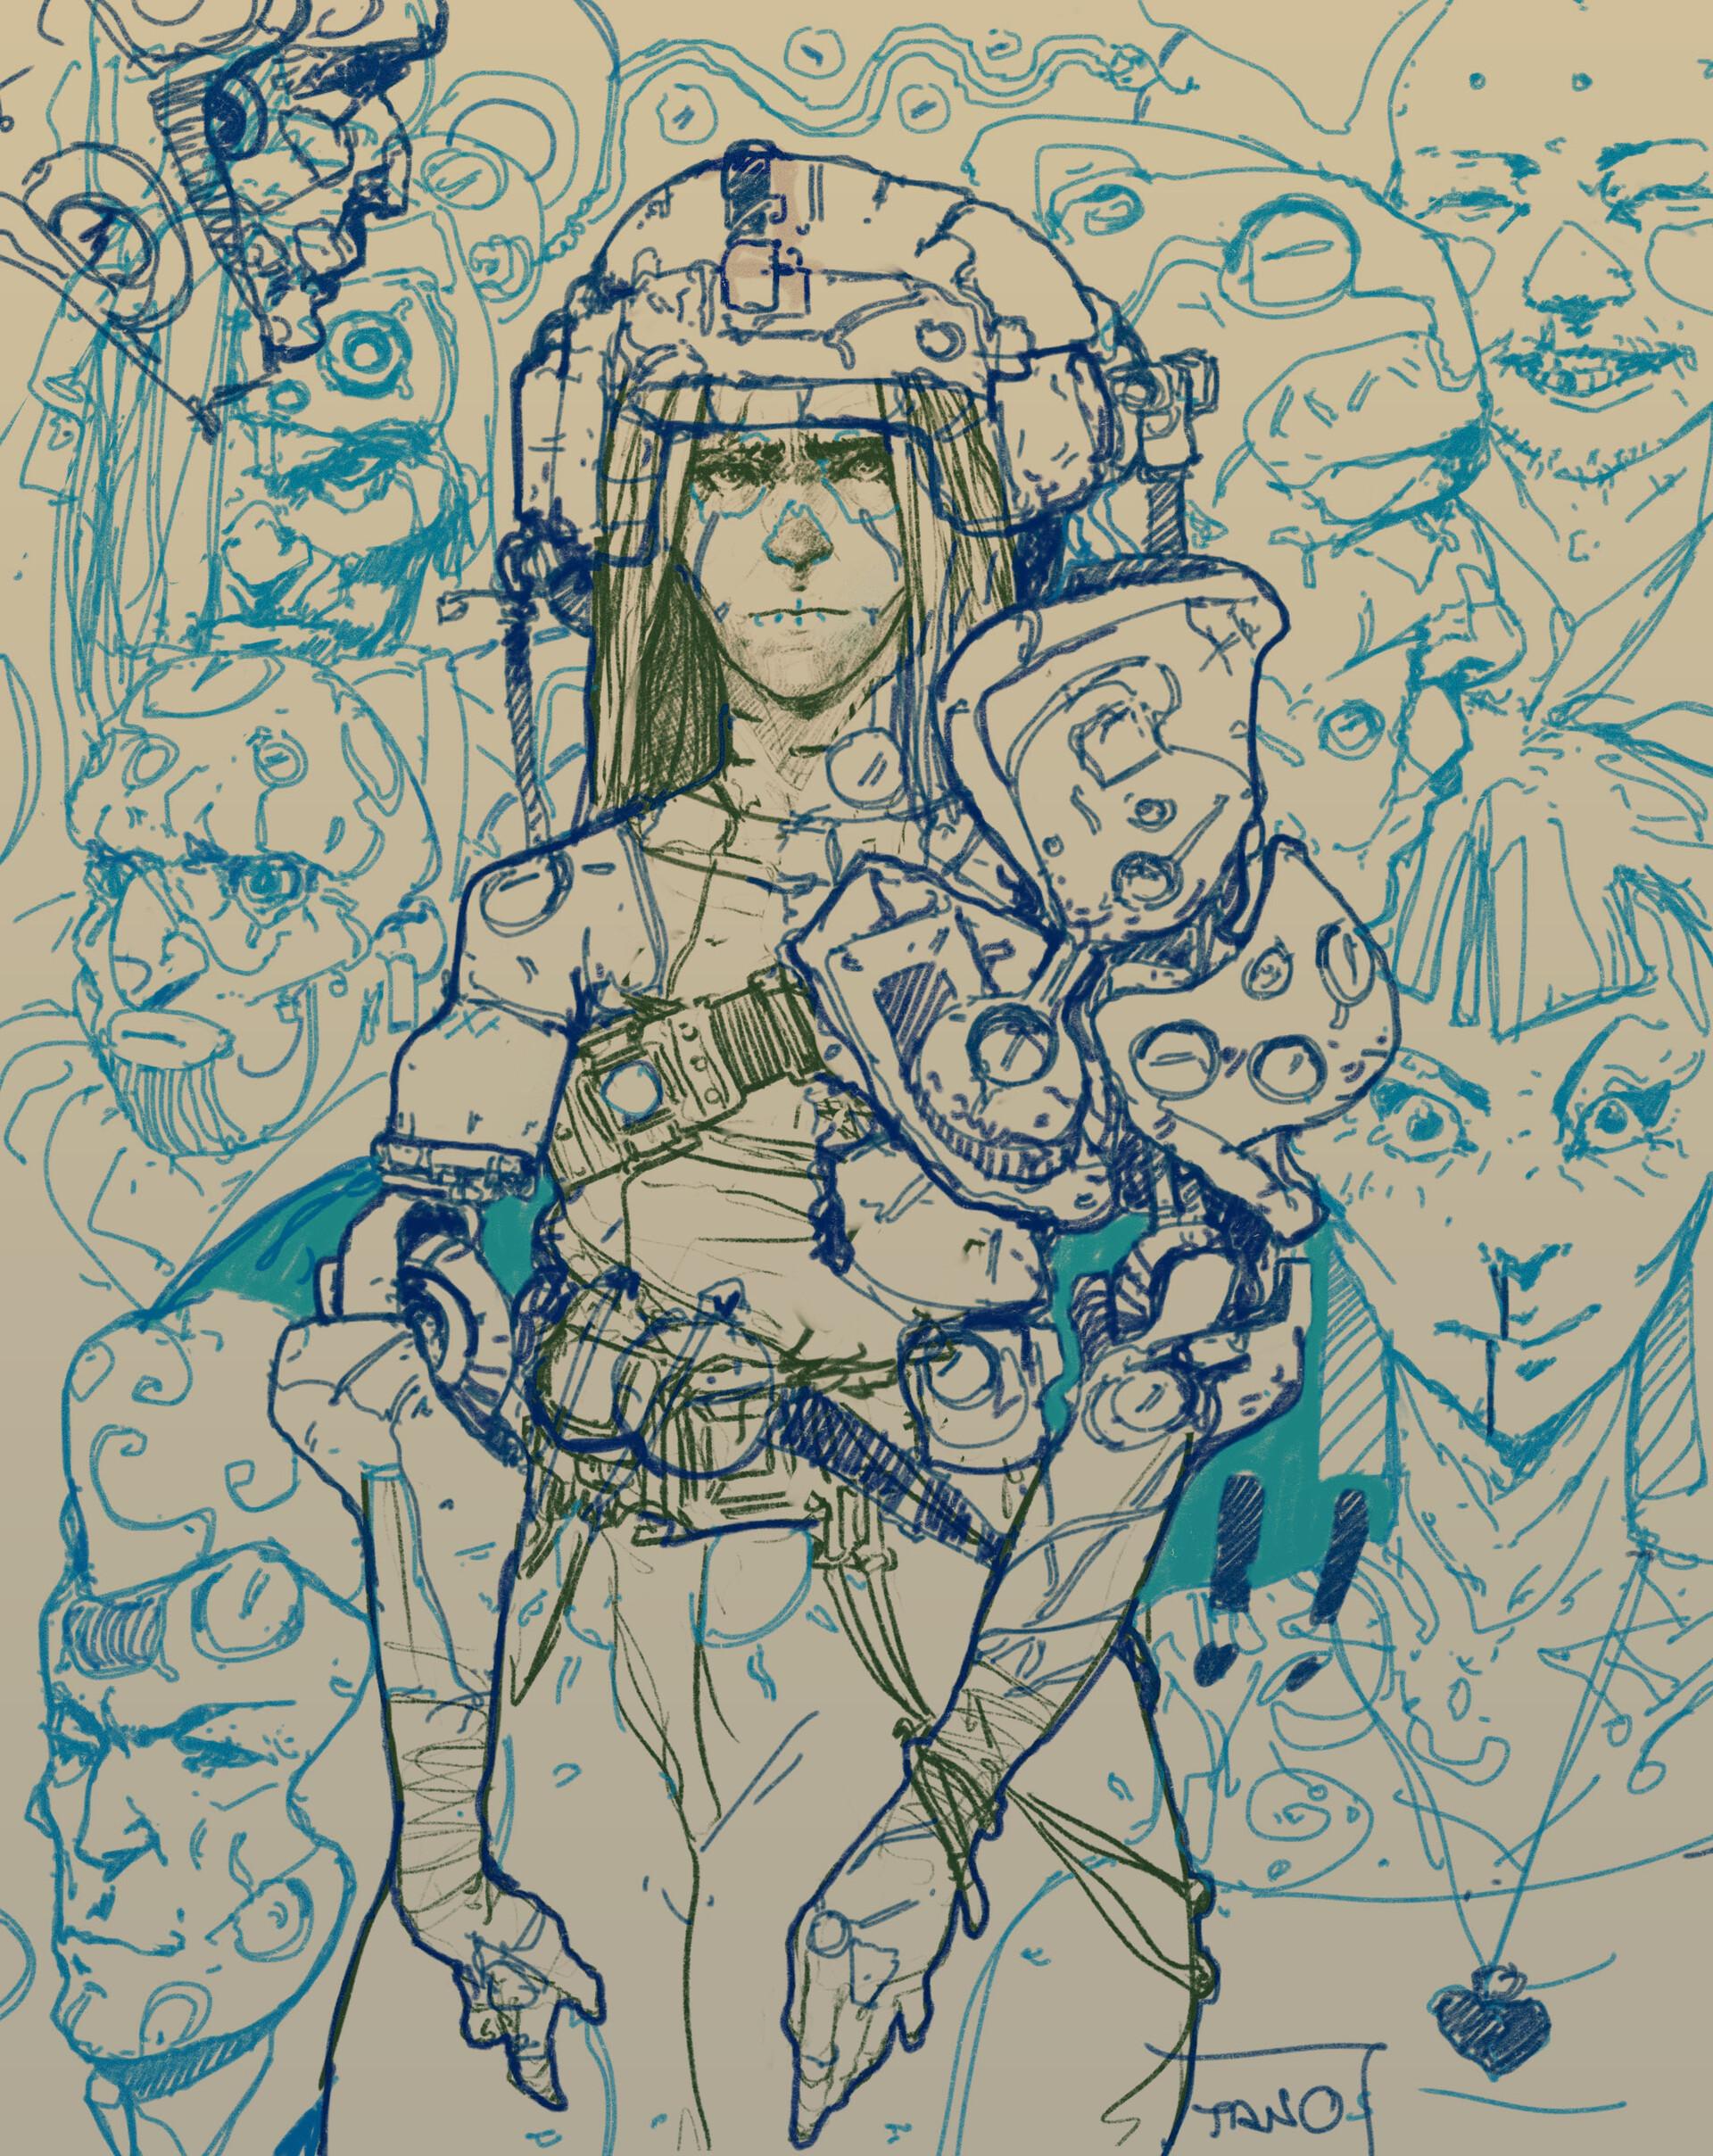 Tano bonfanti morning sketch2 copy